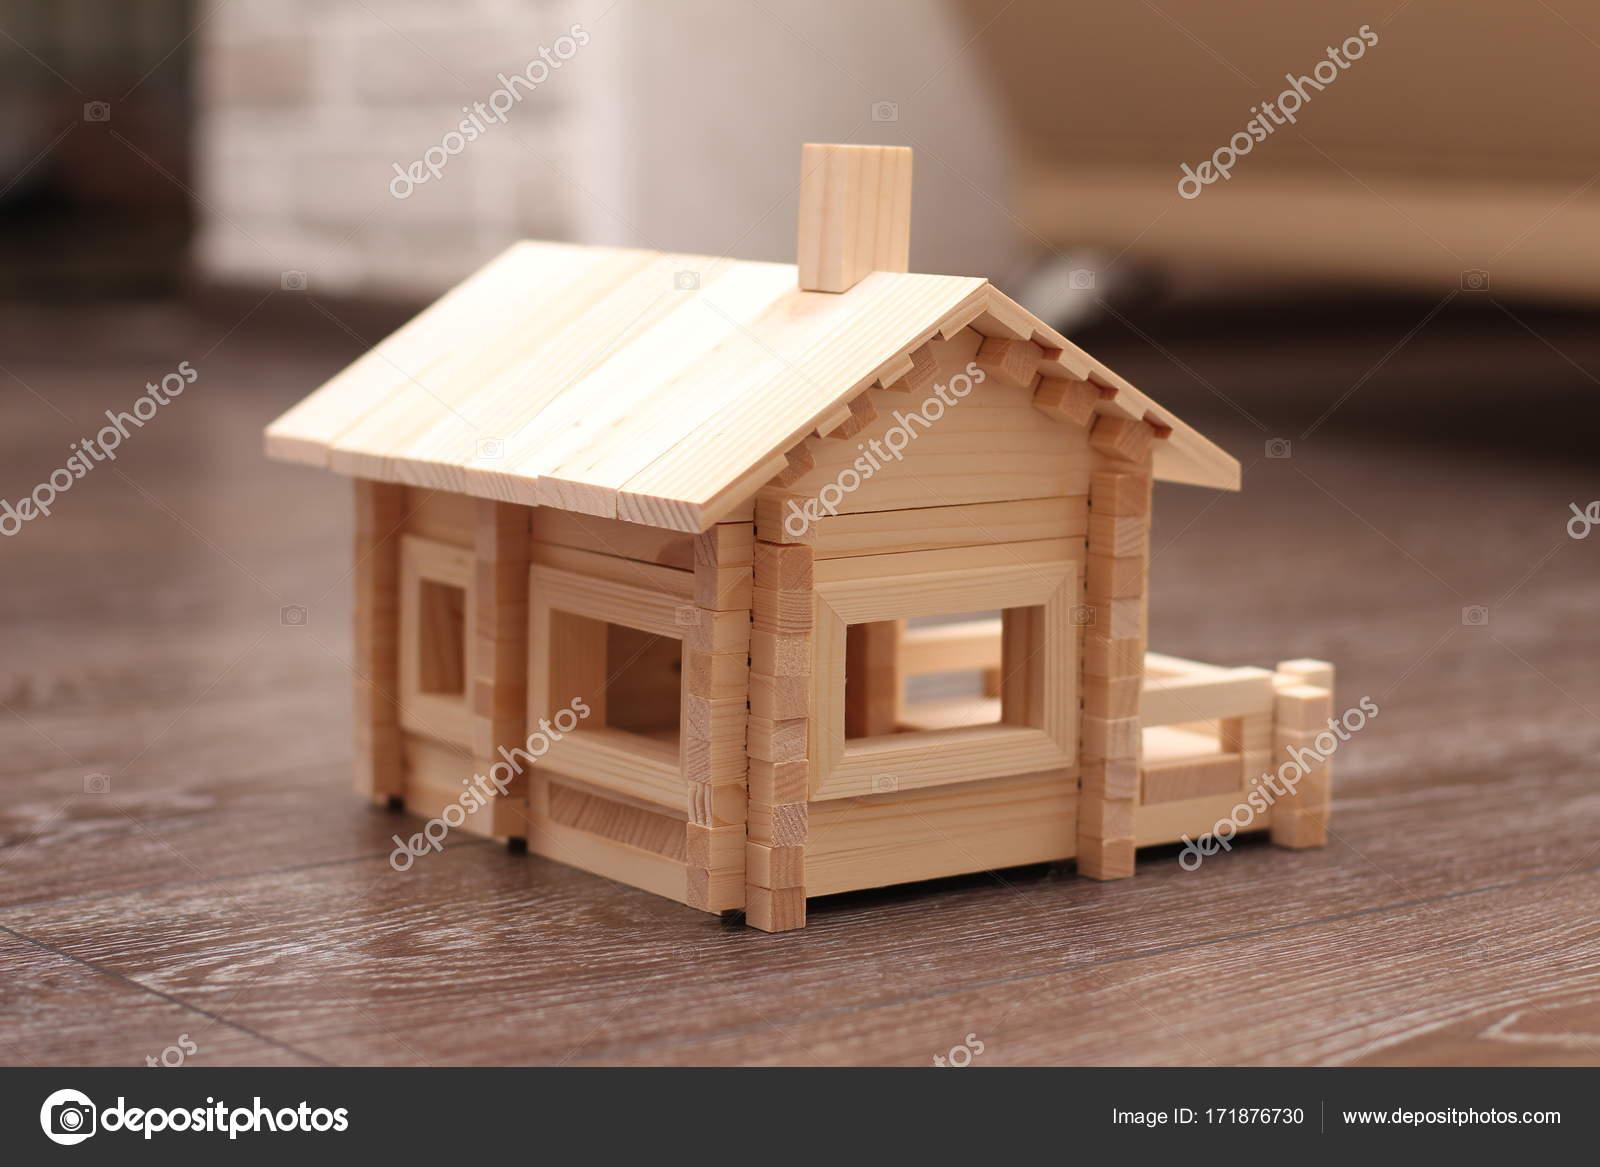 d4e51a4c604e Παιχνίδι σπίτι από ξύλινες ράβδους — Φωτογραφία Αρχείου © Svoboda102 ...